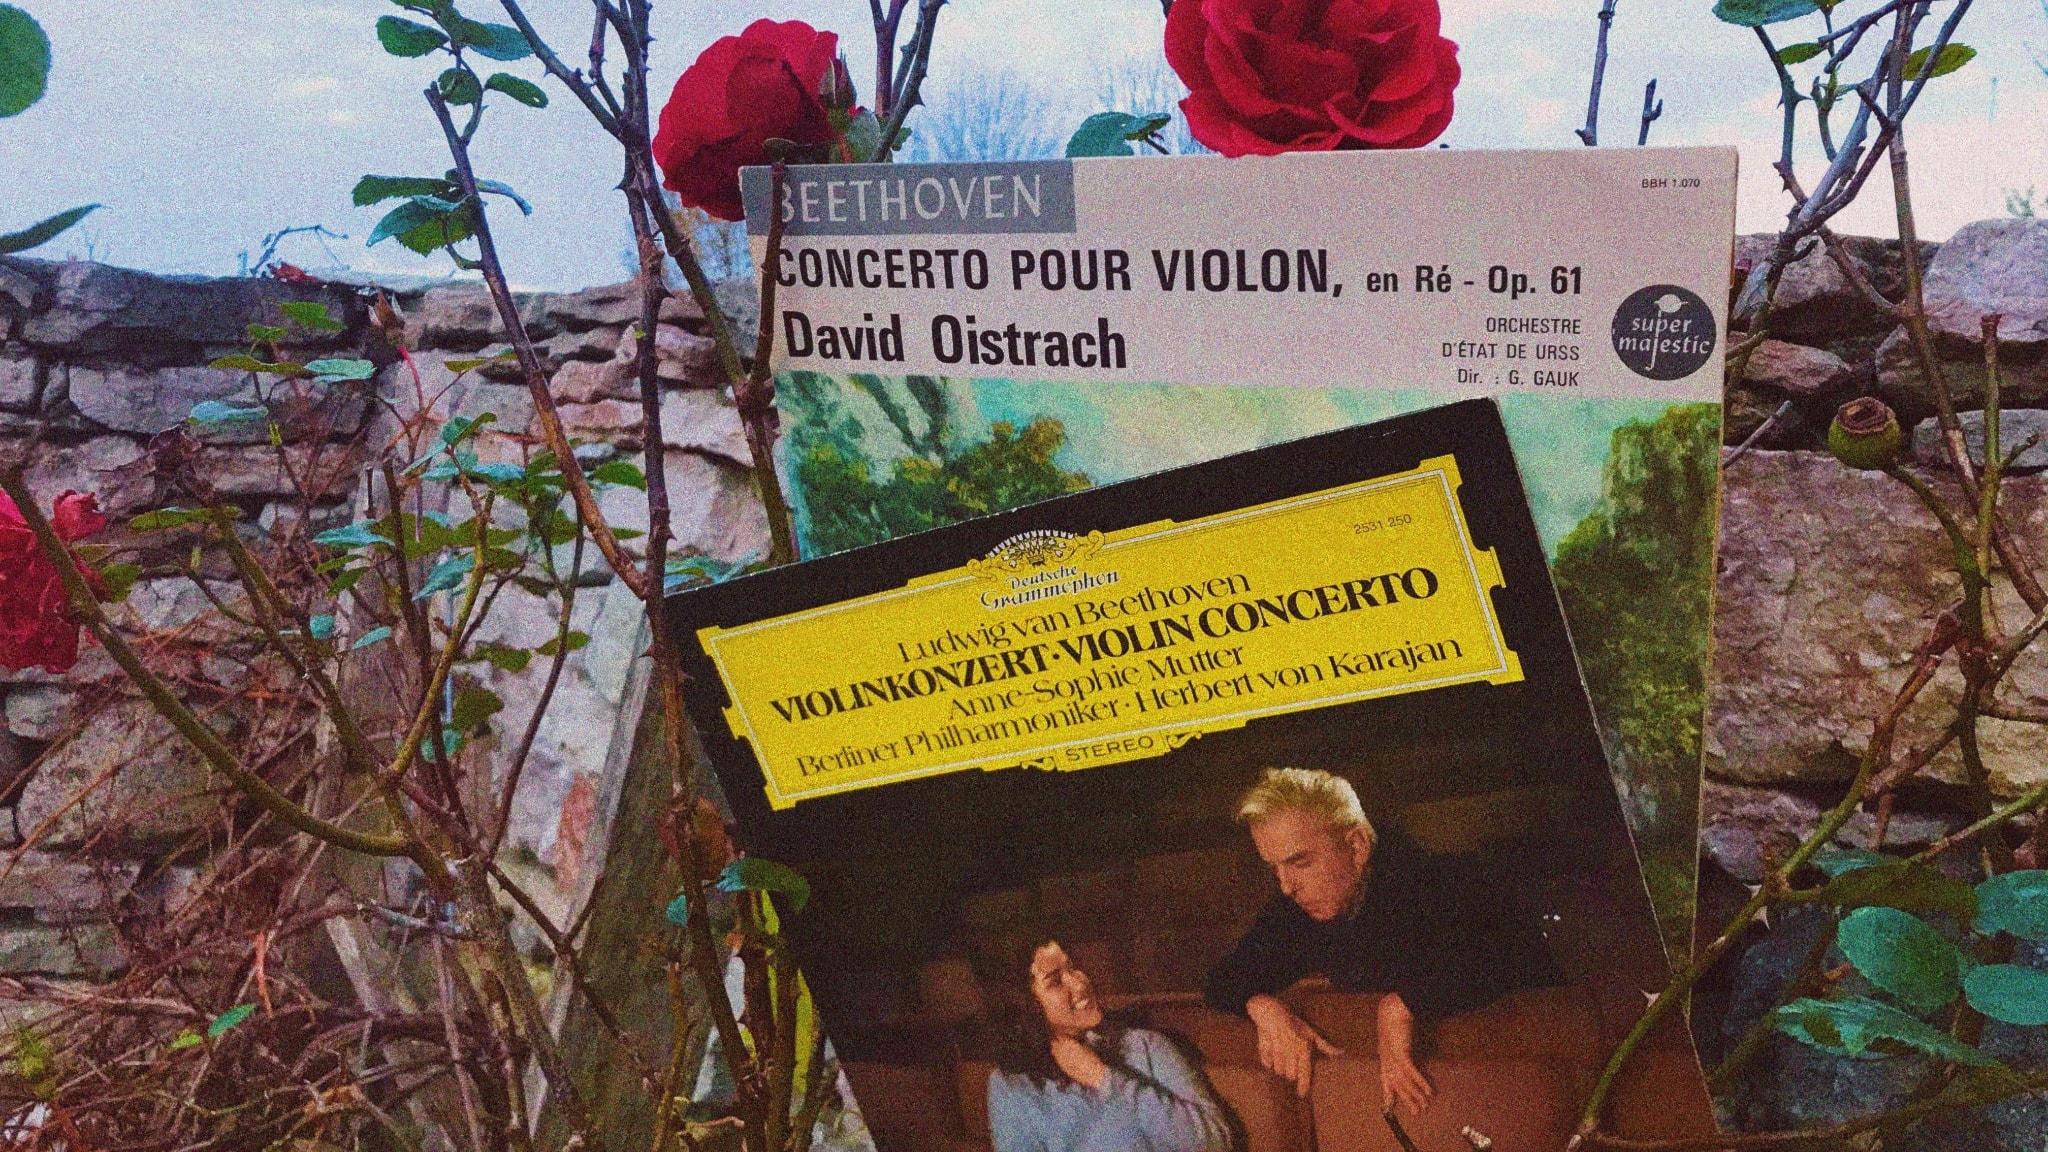 Minnen av Beethovens violinkonsert